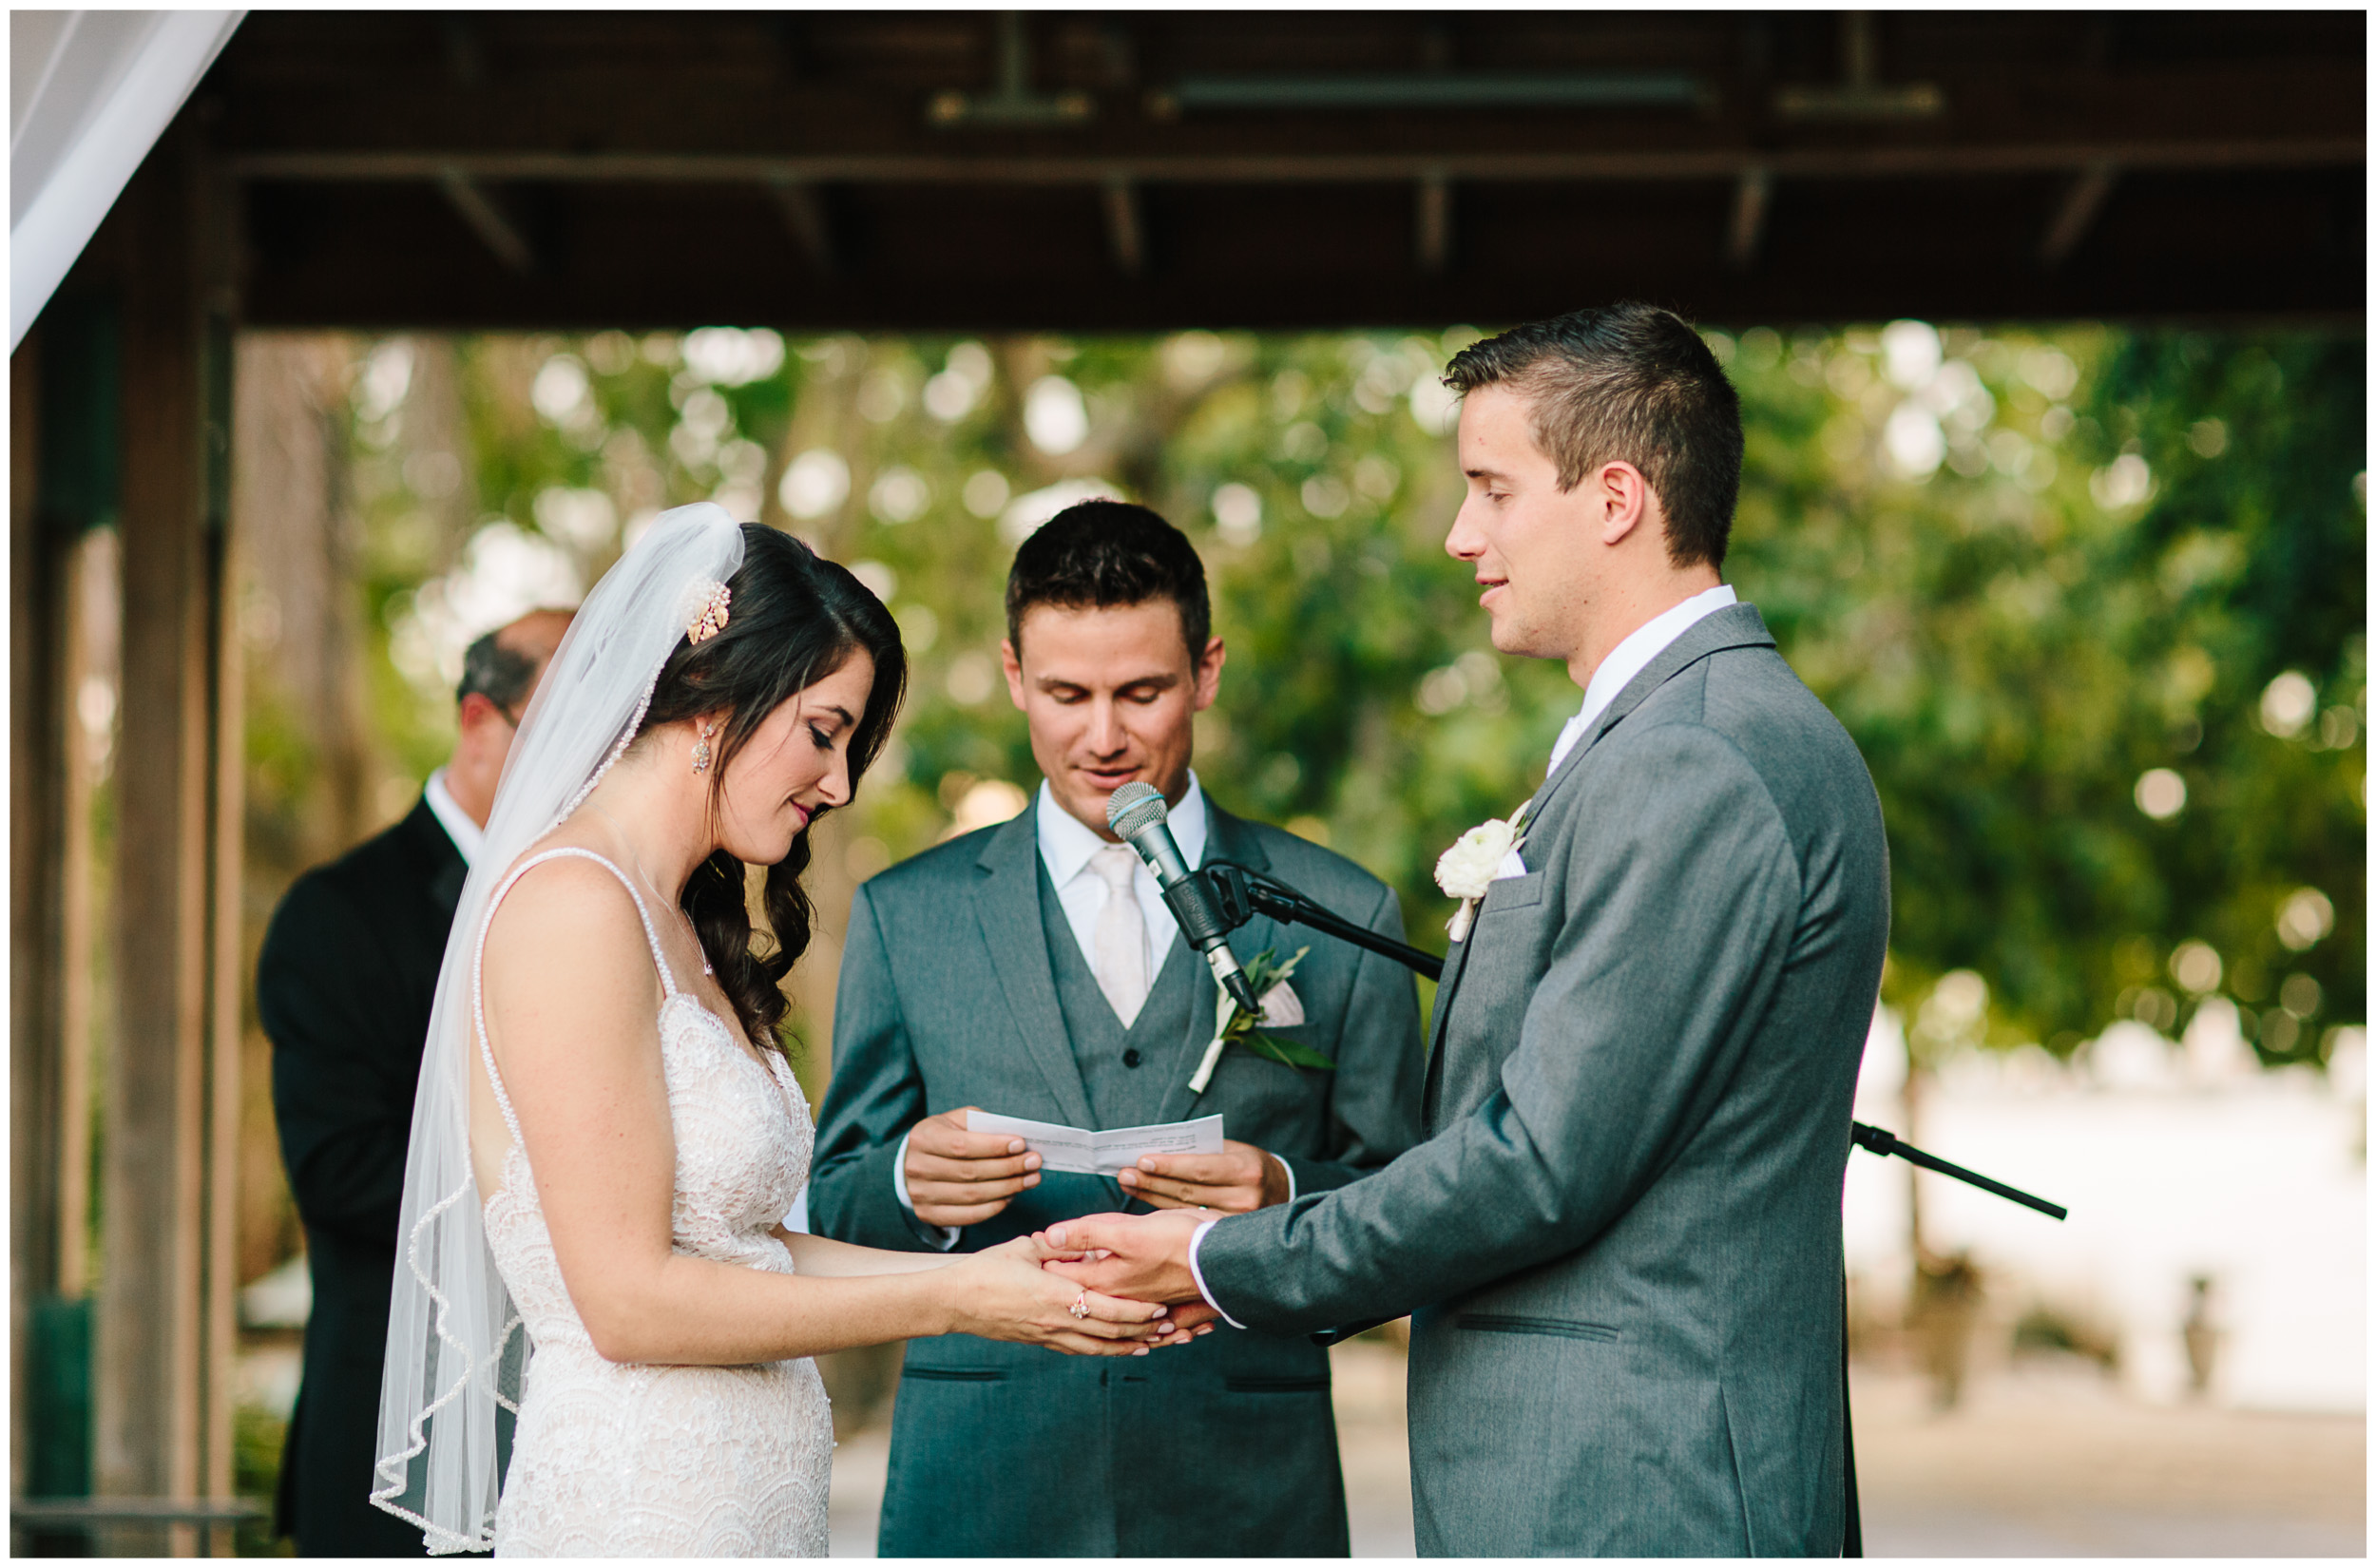 marie_selby_wedding_65a.jpg